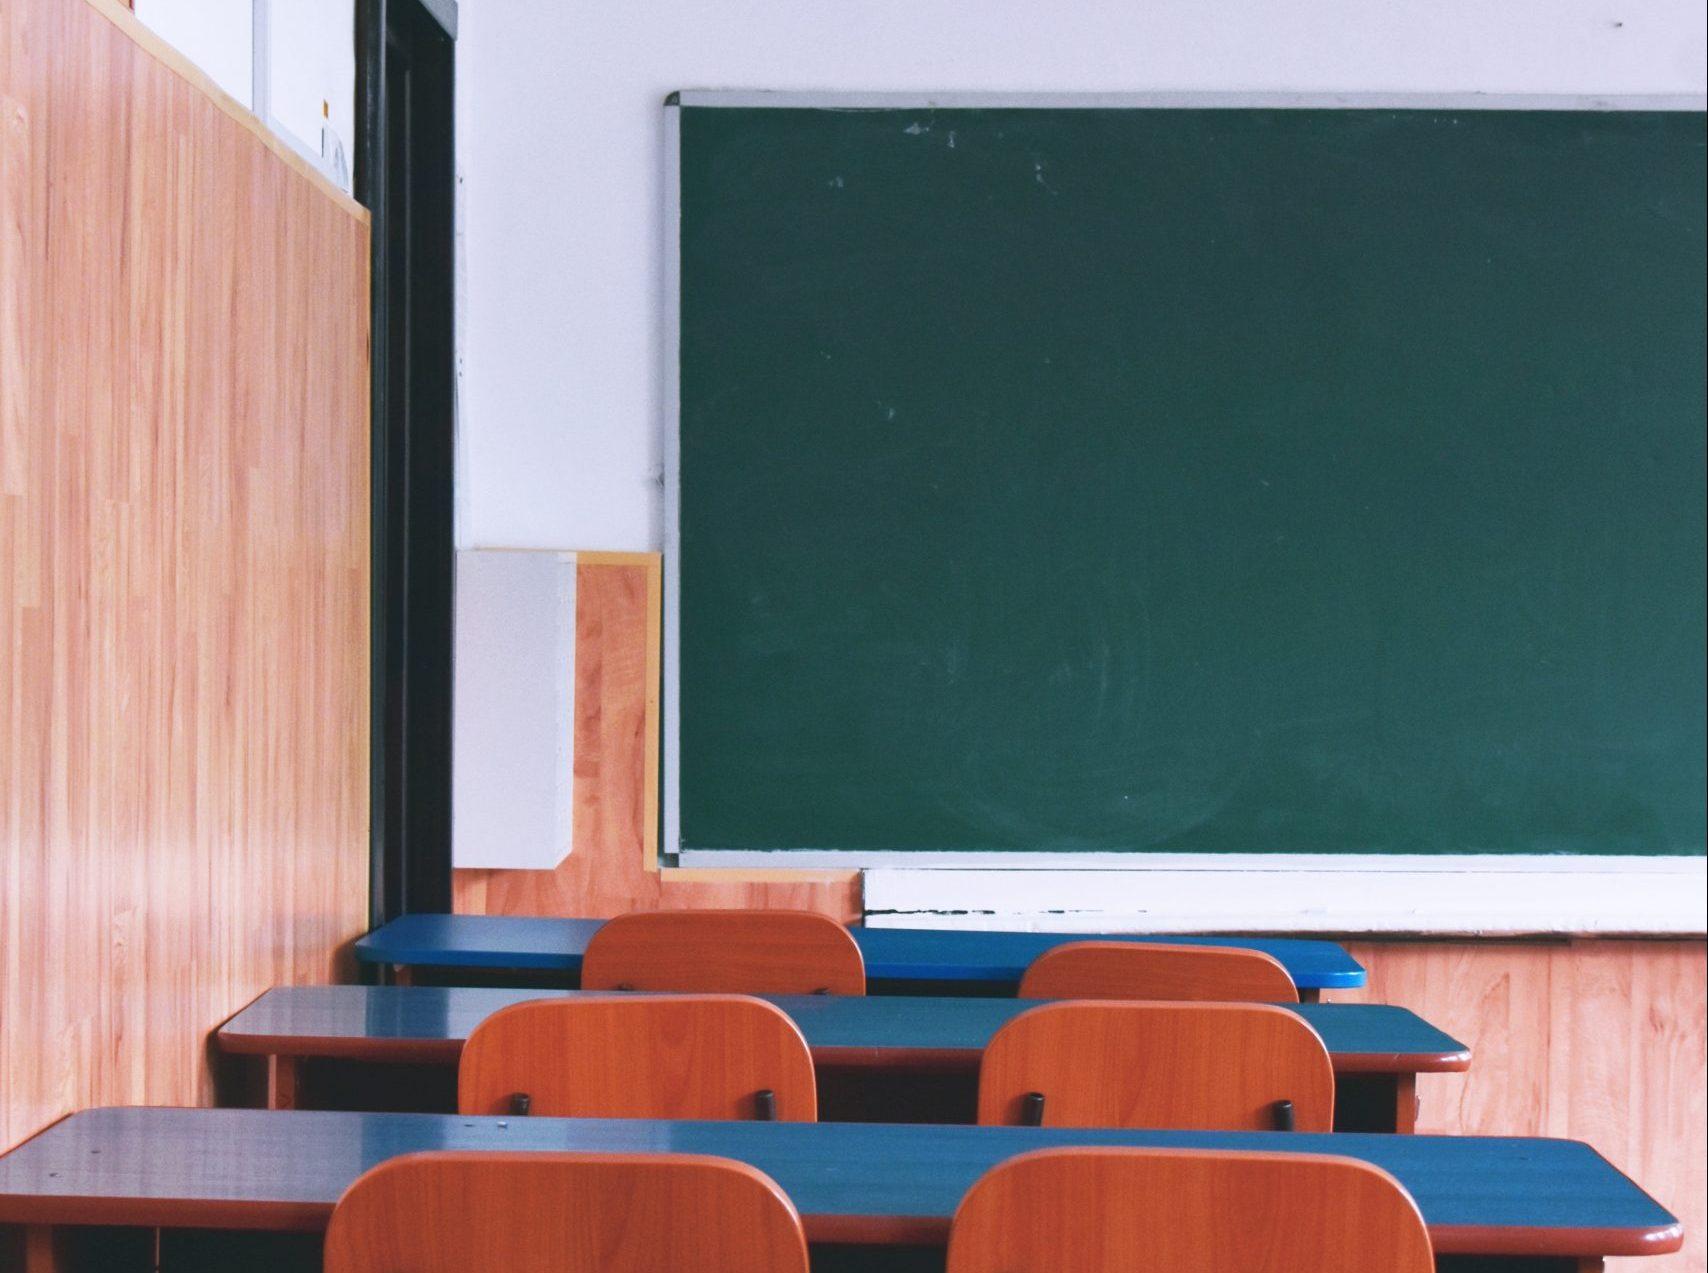 Empty classroom. UK schools have been closed until further notice